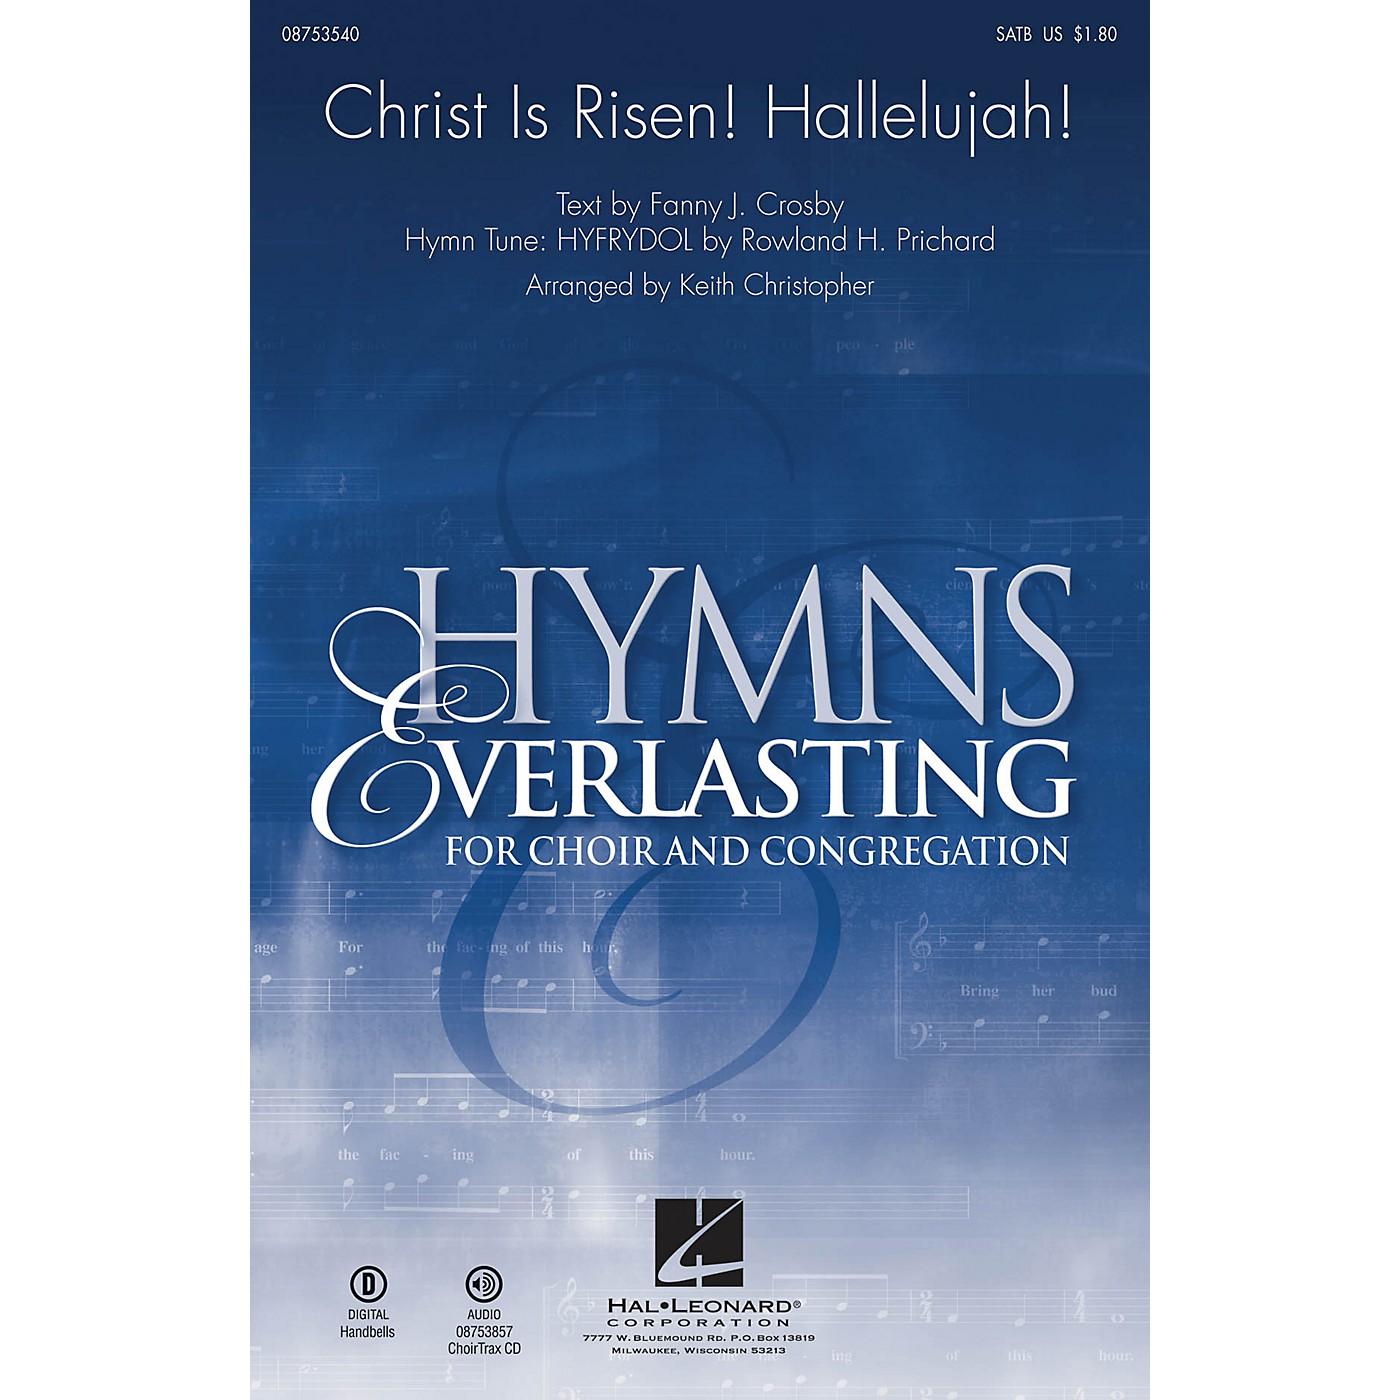 Hal Leonard Christ Is Risen! Hallelujah! HANDBELL PARTS (5PAK) Arranged by Keith Christopher thumbnail